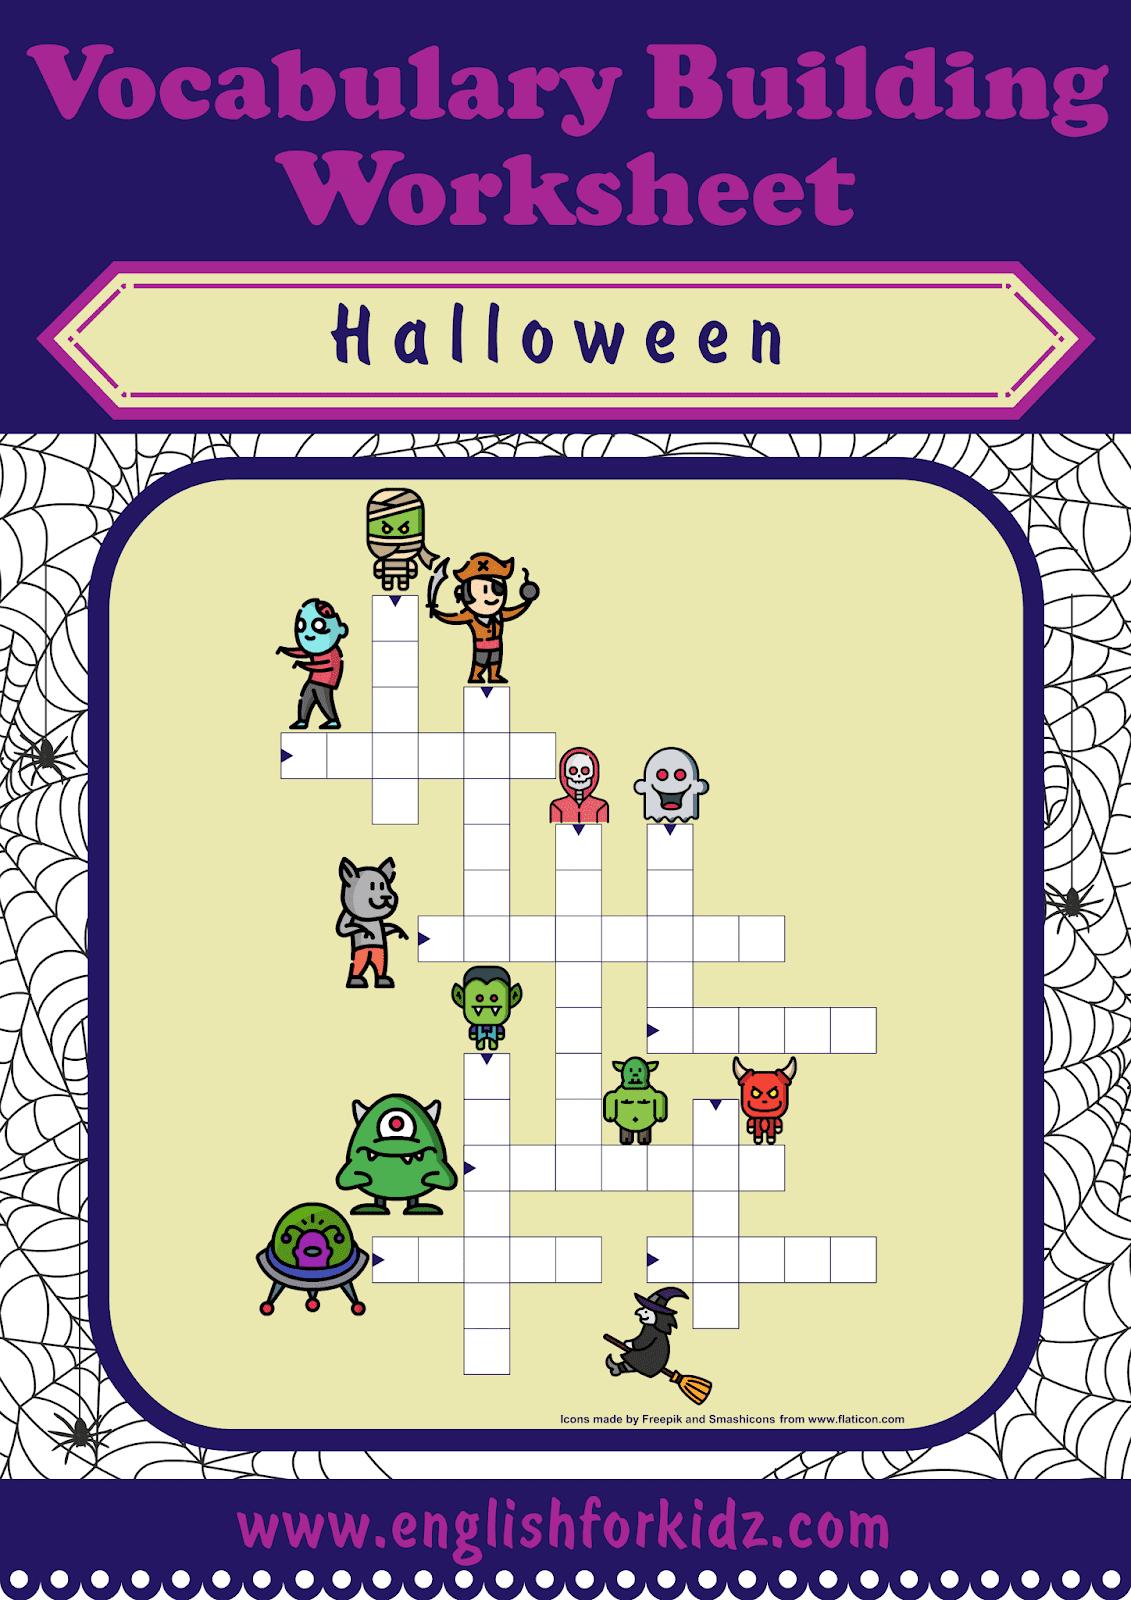 English For Kids Step By Step Printable Halloween